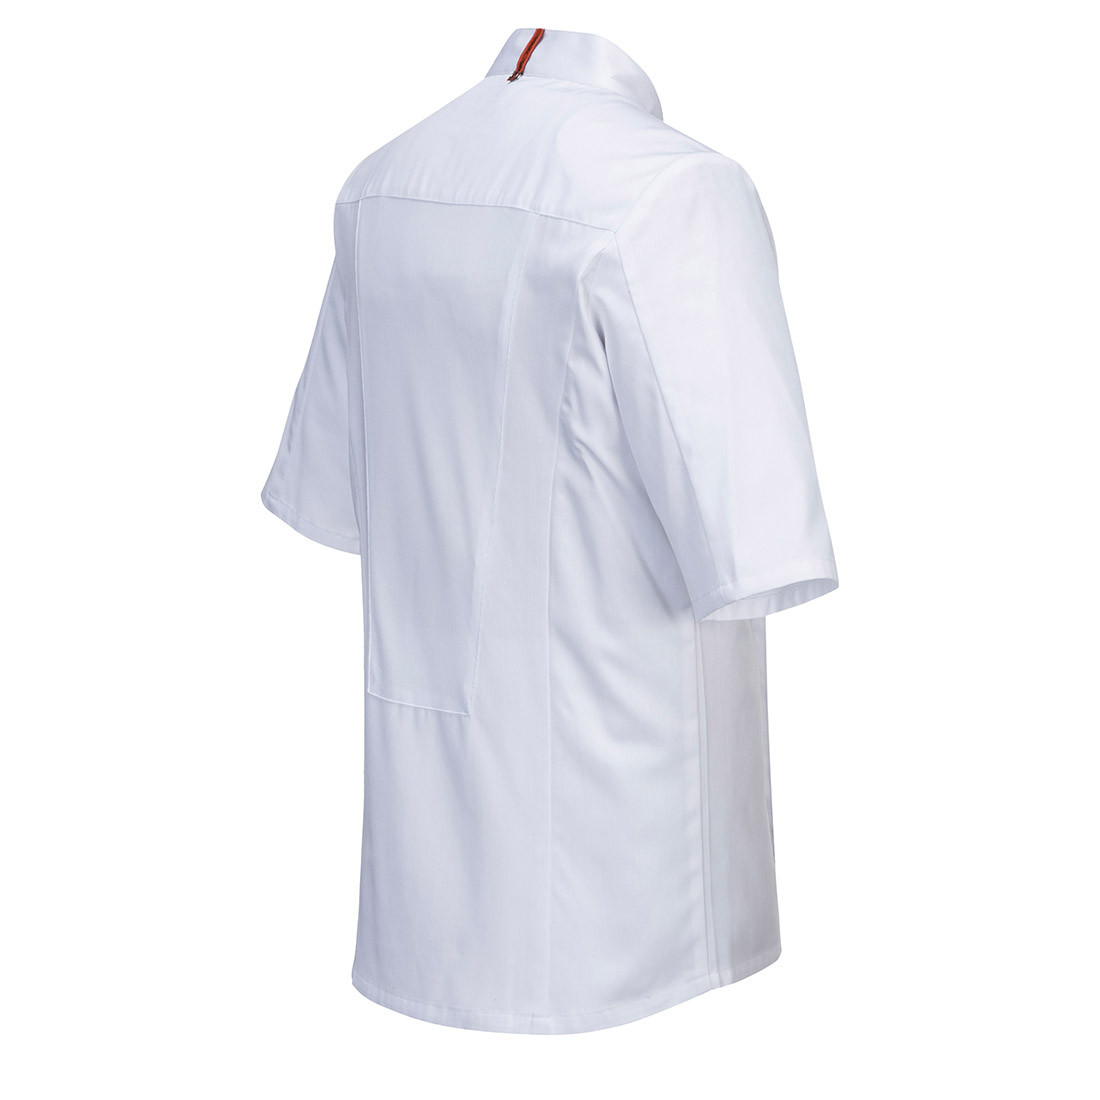 Jacheta MeshAir S/S - Imbracaminte de protectie